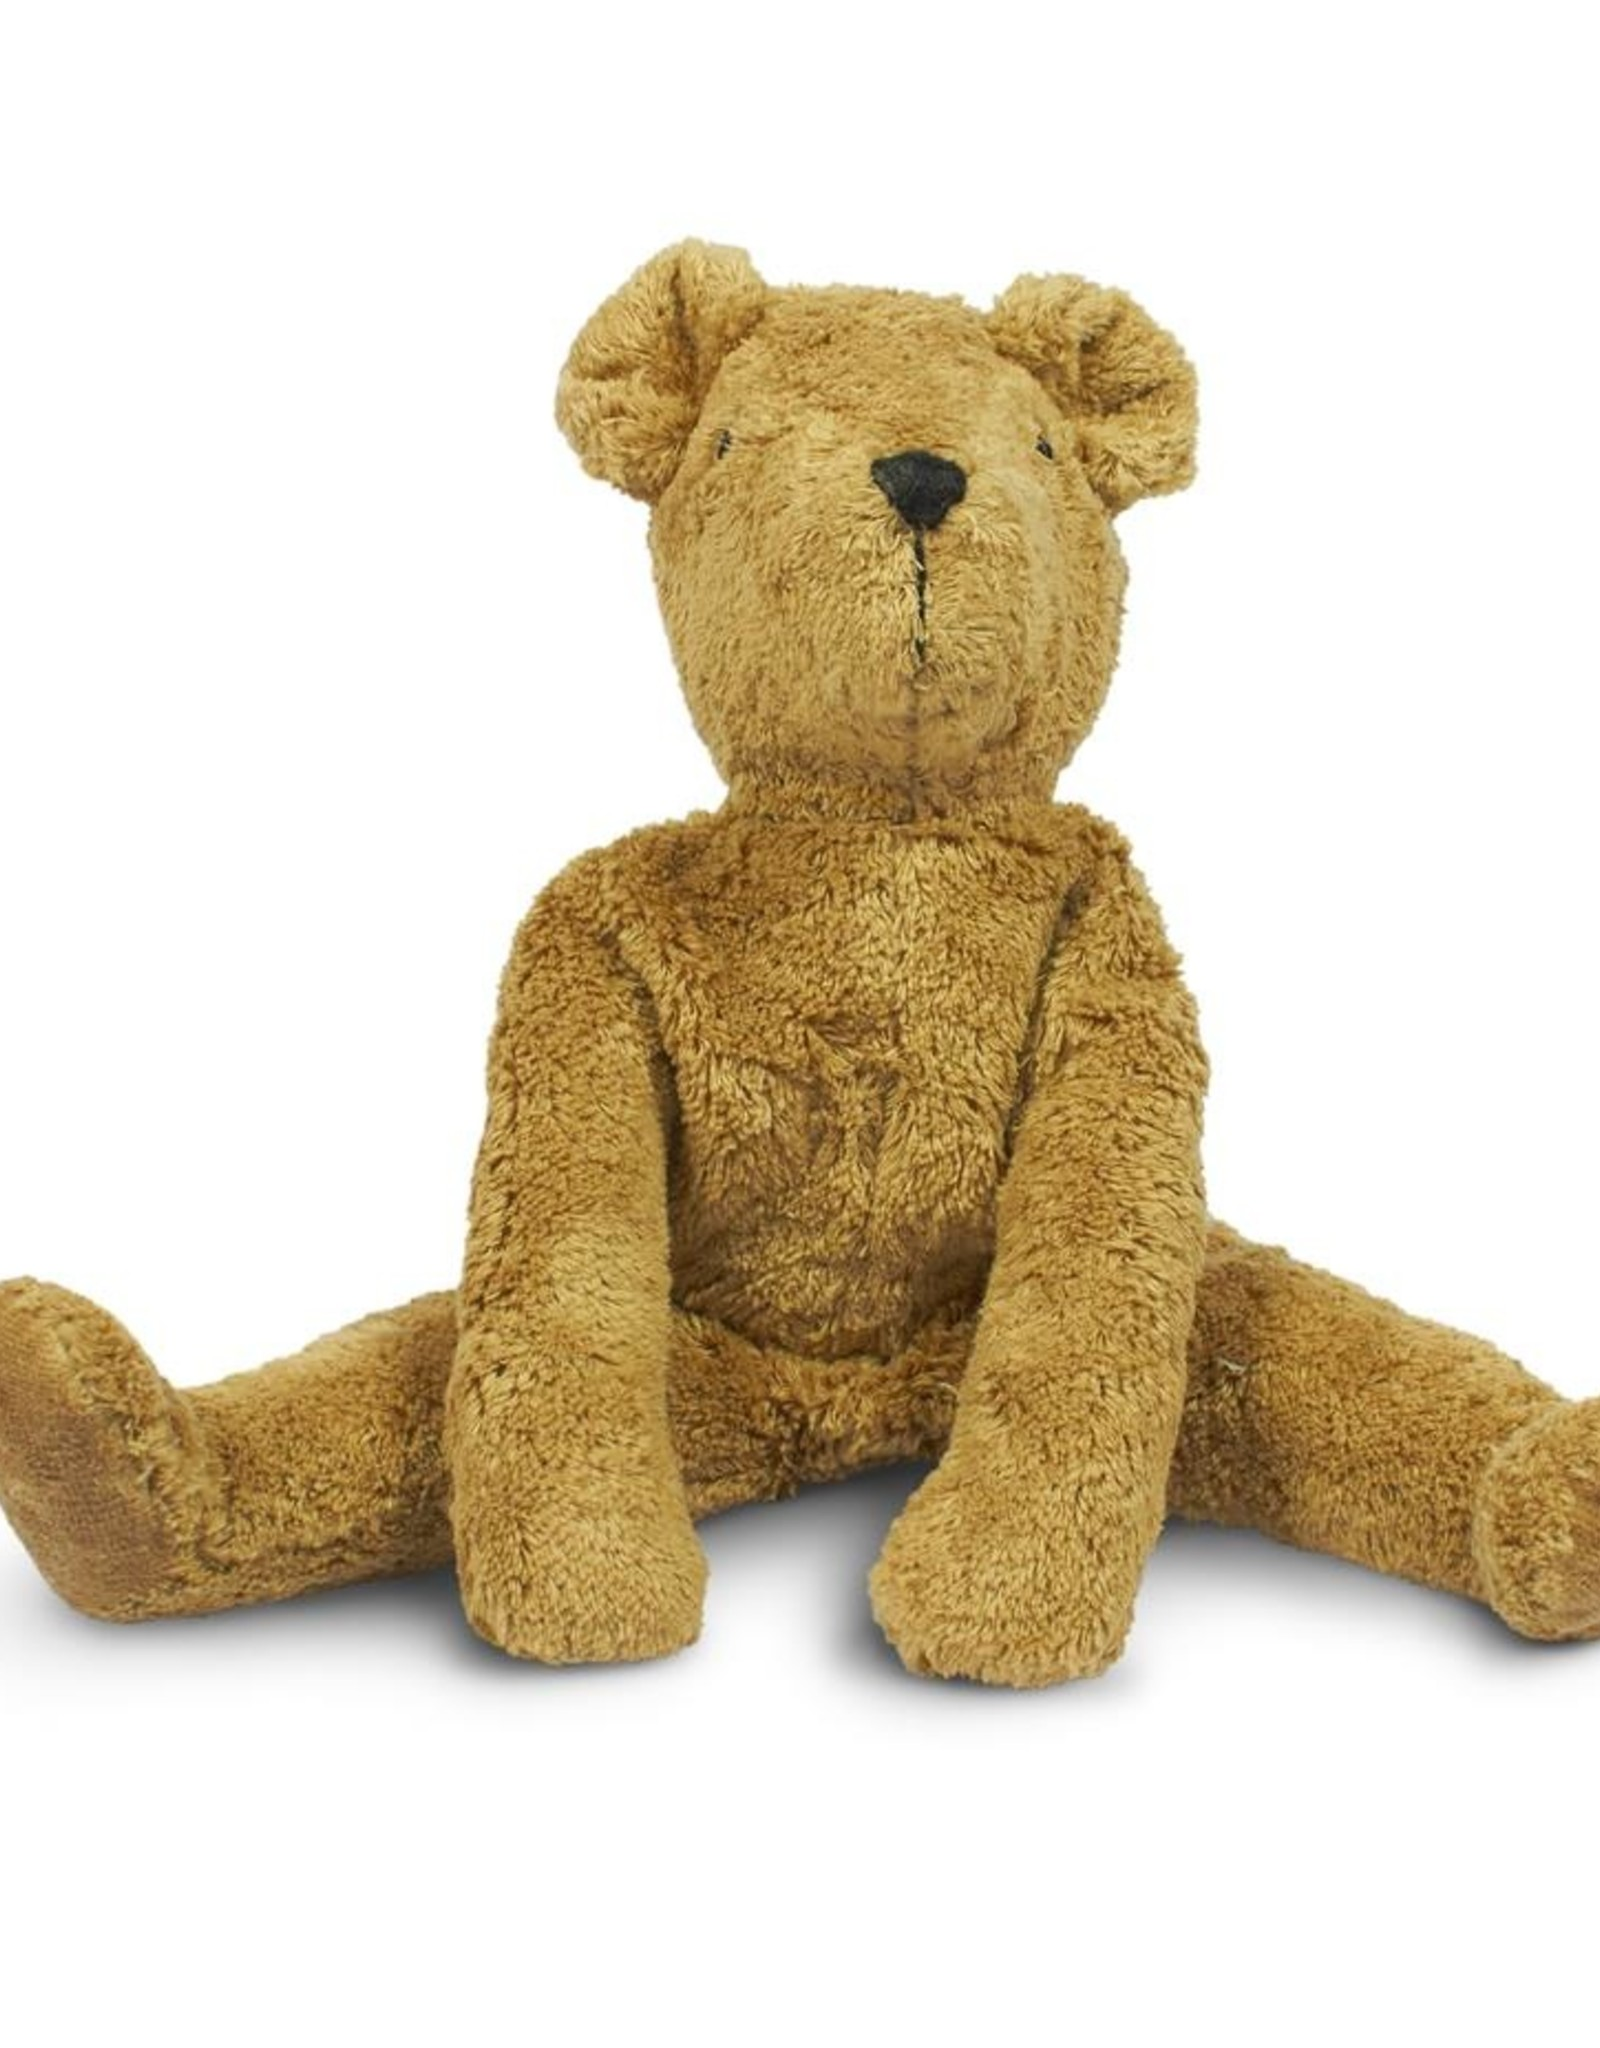 Senger Naturwelt Big Bear, the floppy animal